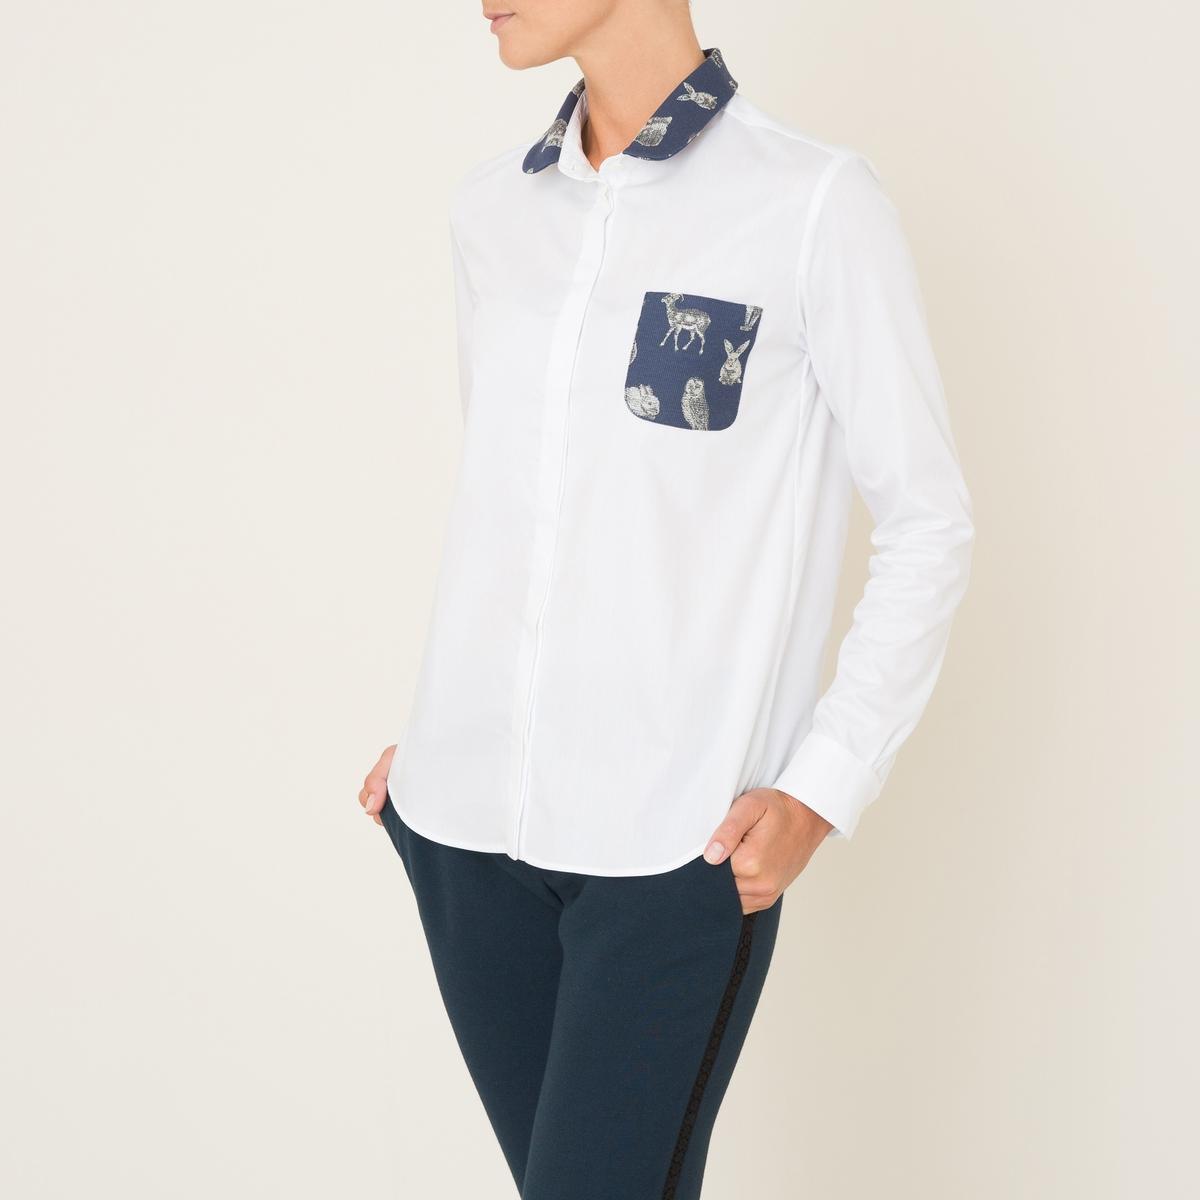 Рубашка BAMBINO EXCLUSIVITE BRAND BOUTIQUEСостав и описание Материал : 100% хлопка.Воротник и карман : 66% хлопка, 34% полиэстера Марка : PAUL AND JOE SISTER<br><br>Цвет: белый<br>Размер: S